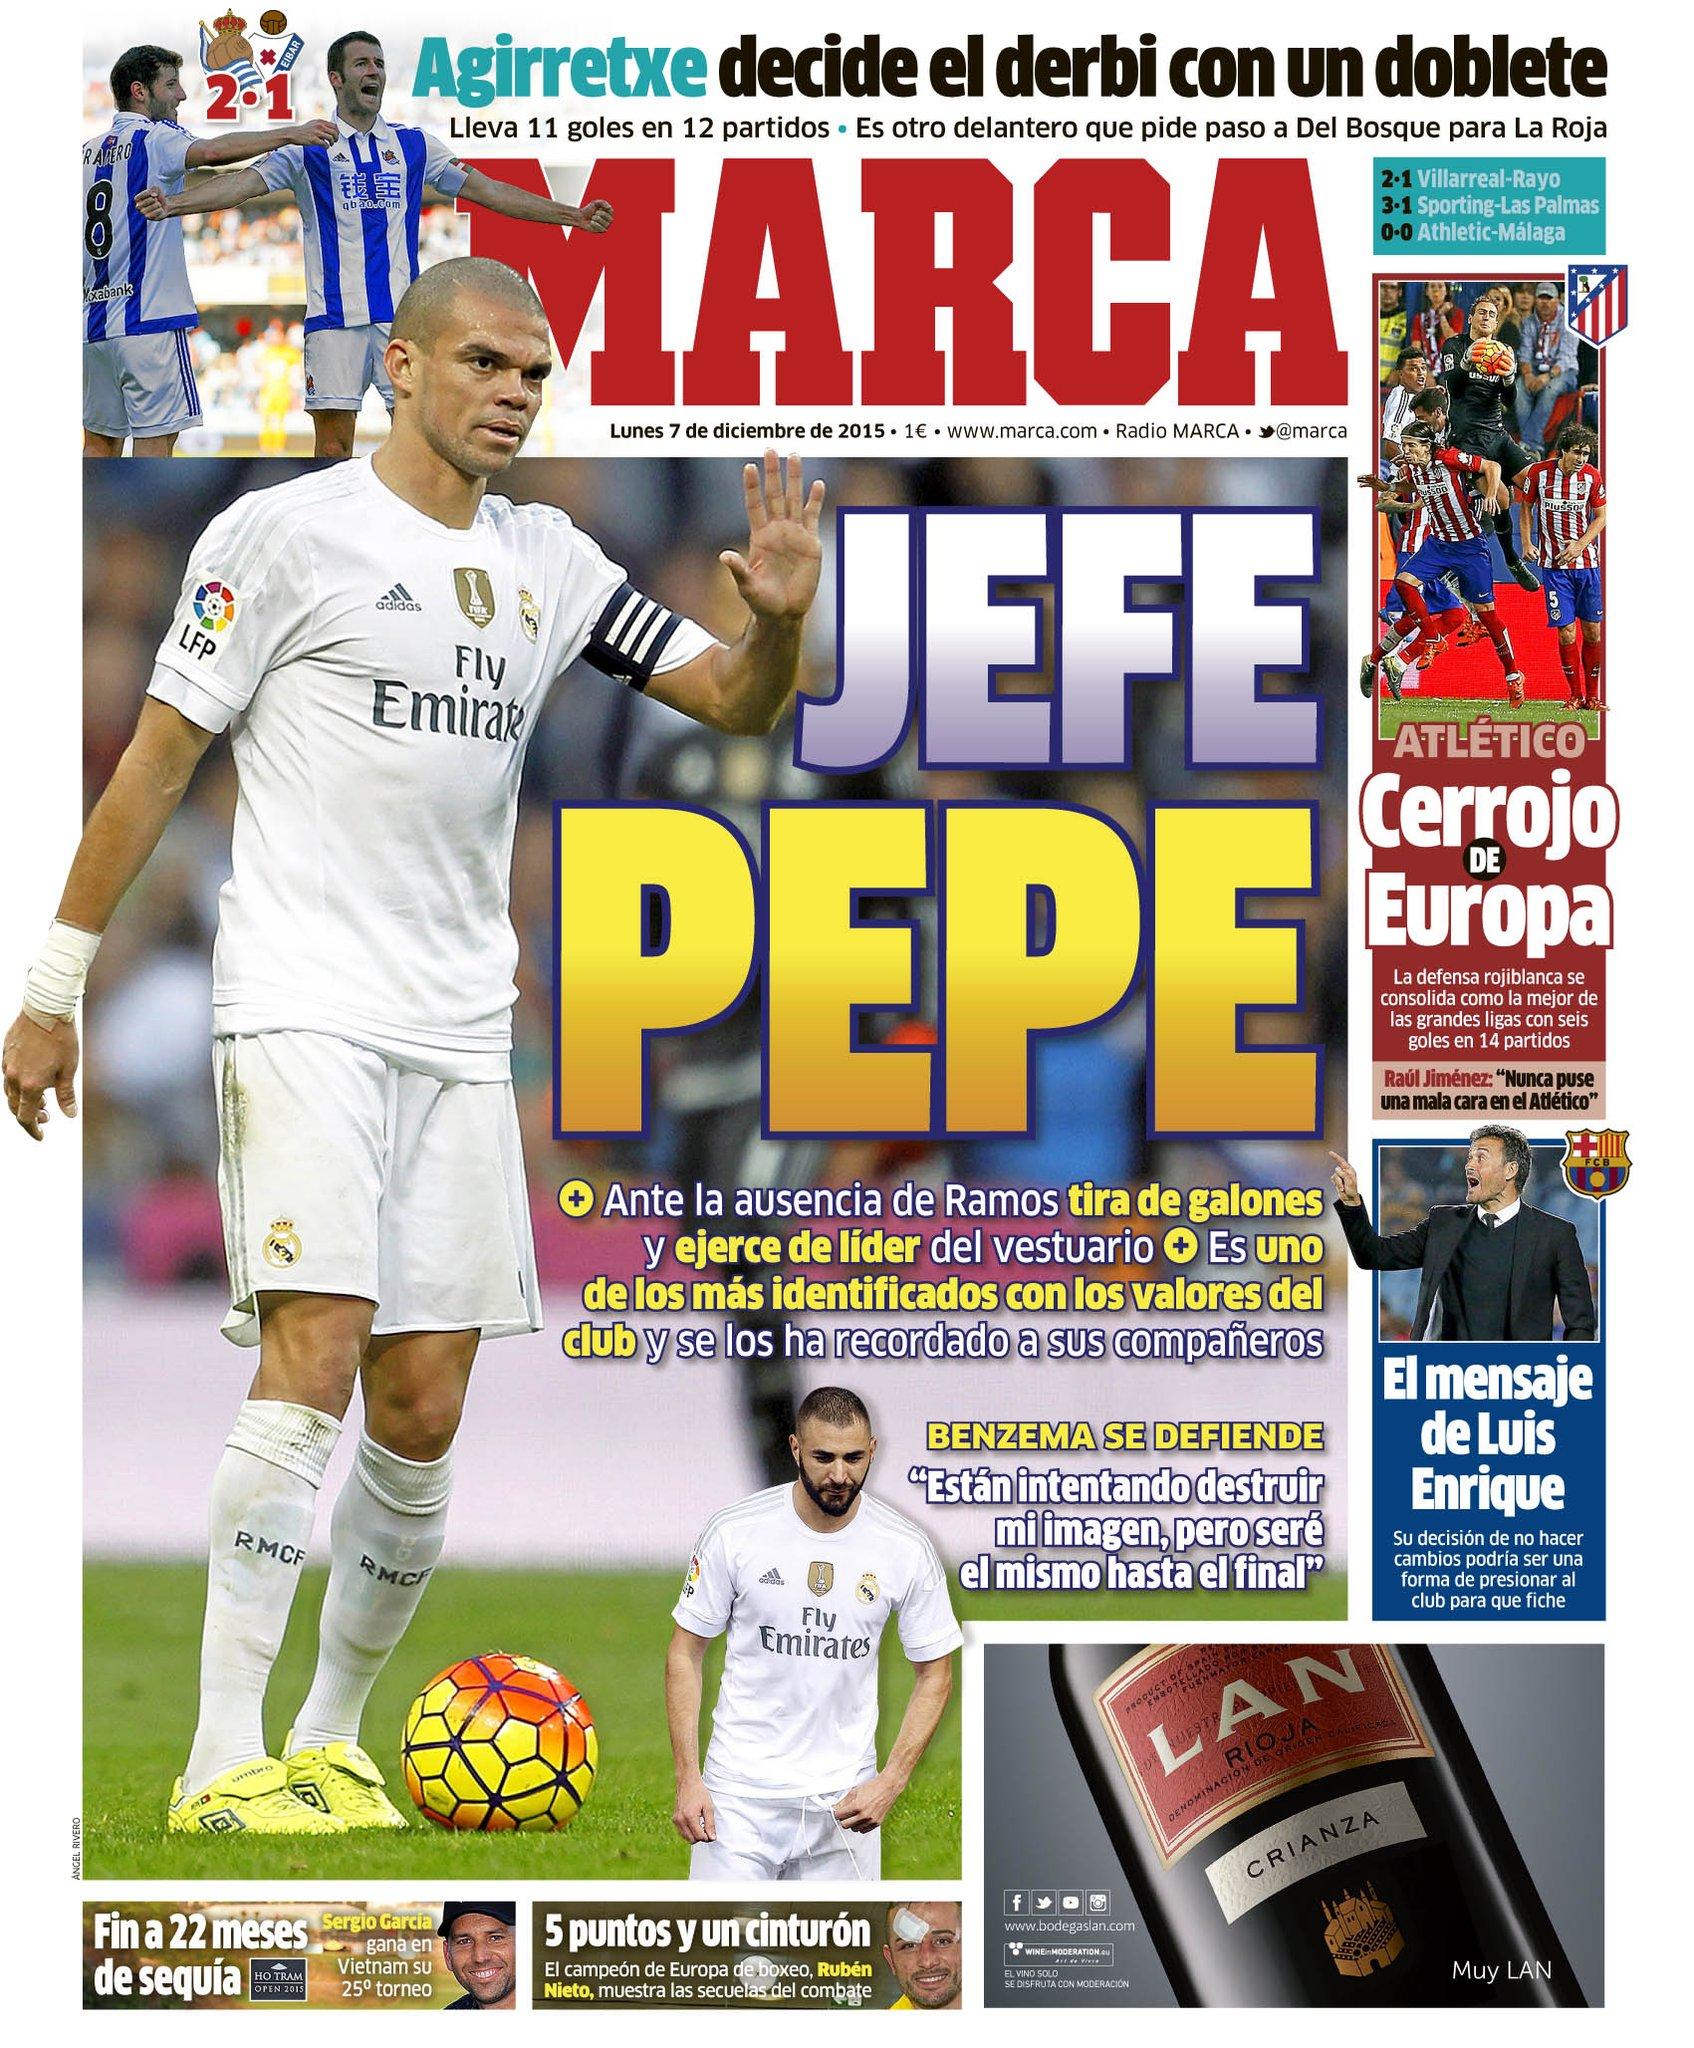 #LaPortada 'Jefe Pepe' https://t.co/M16Td4TFKy